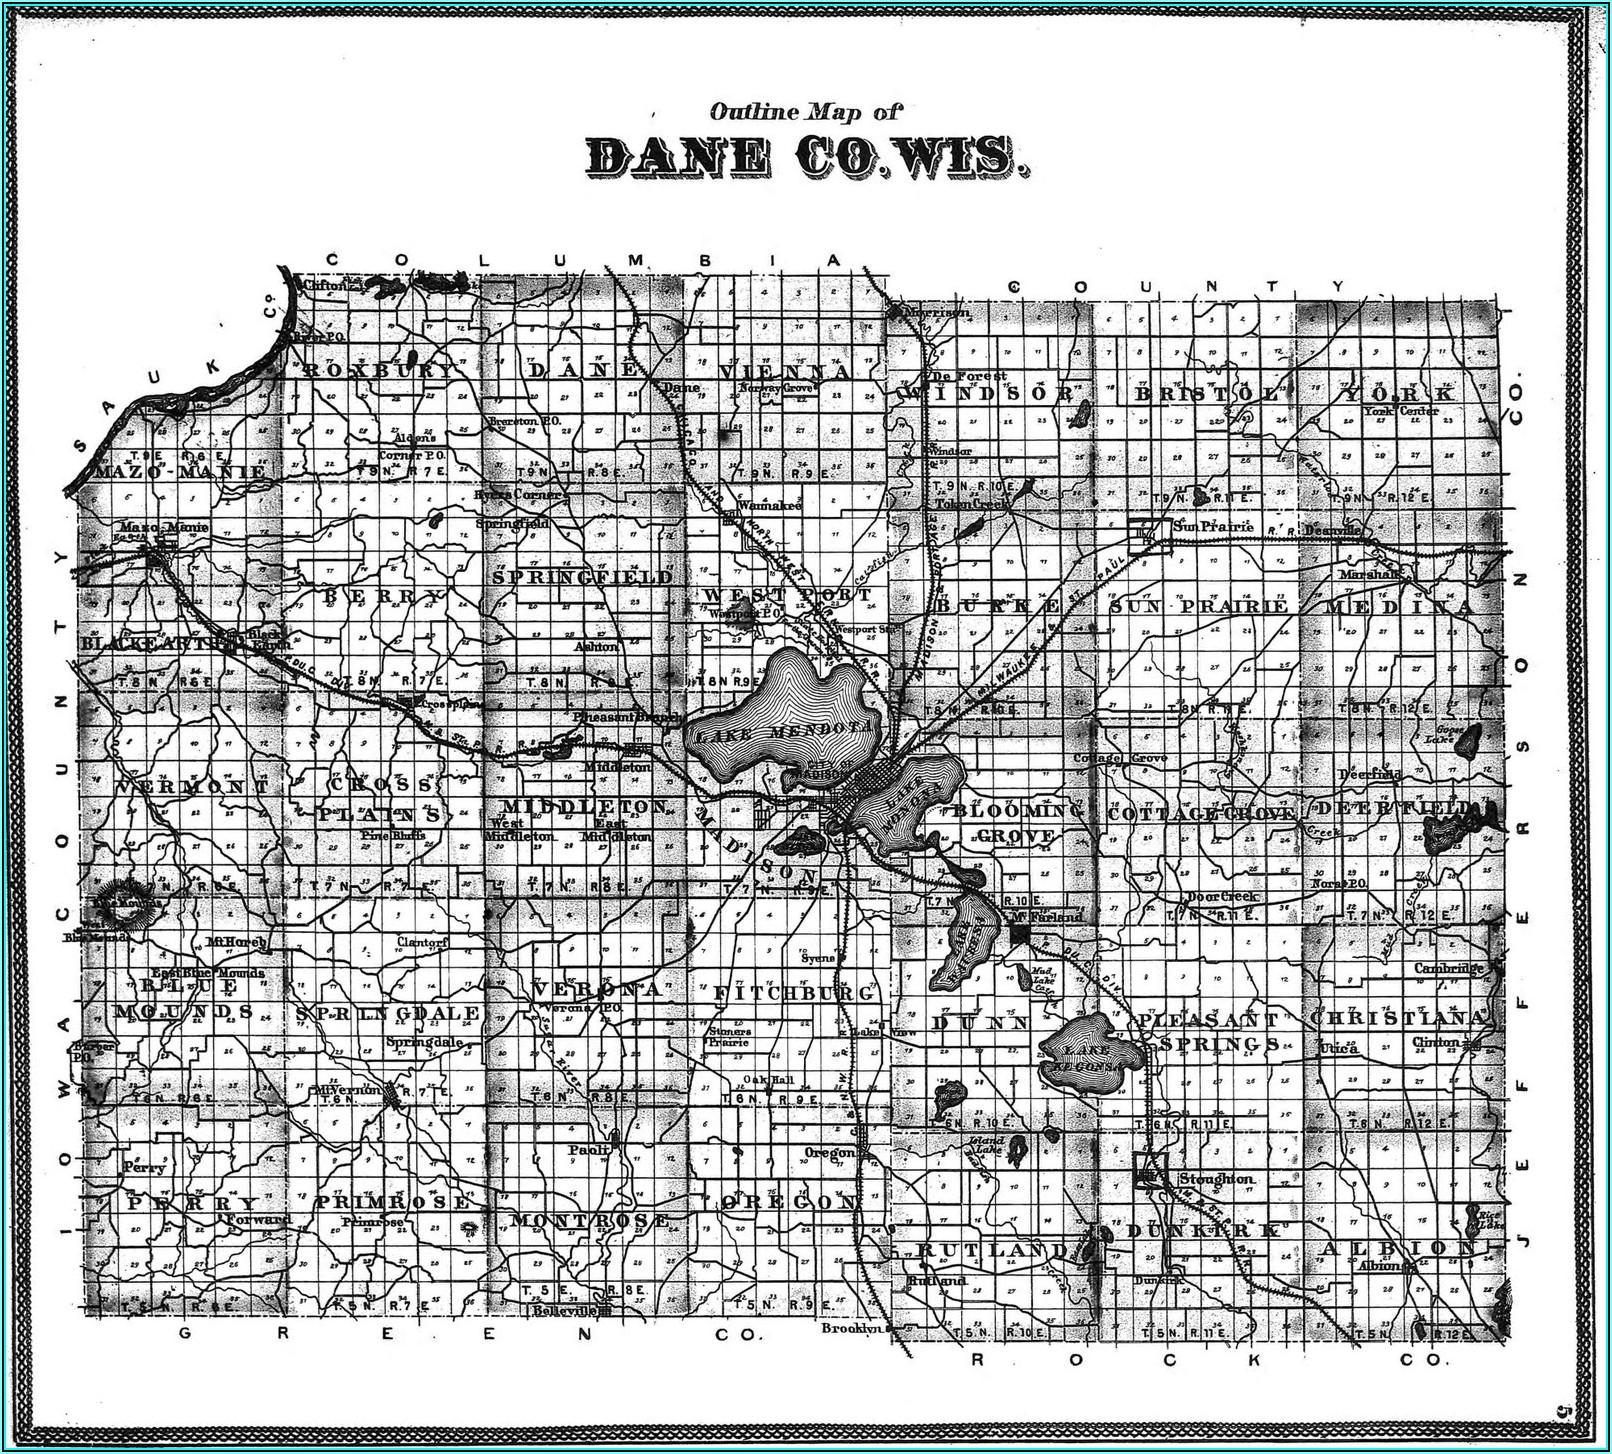 Plat Map Of Dane County Wisconsin